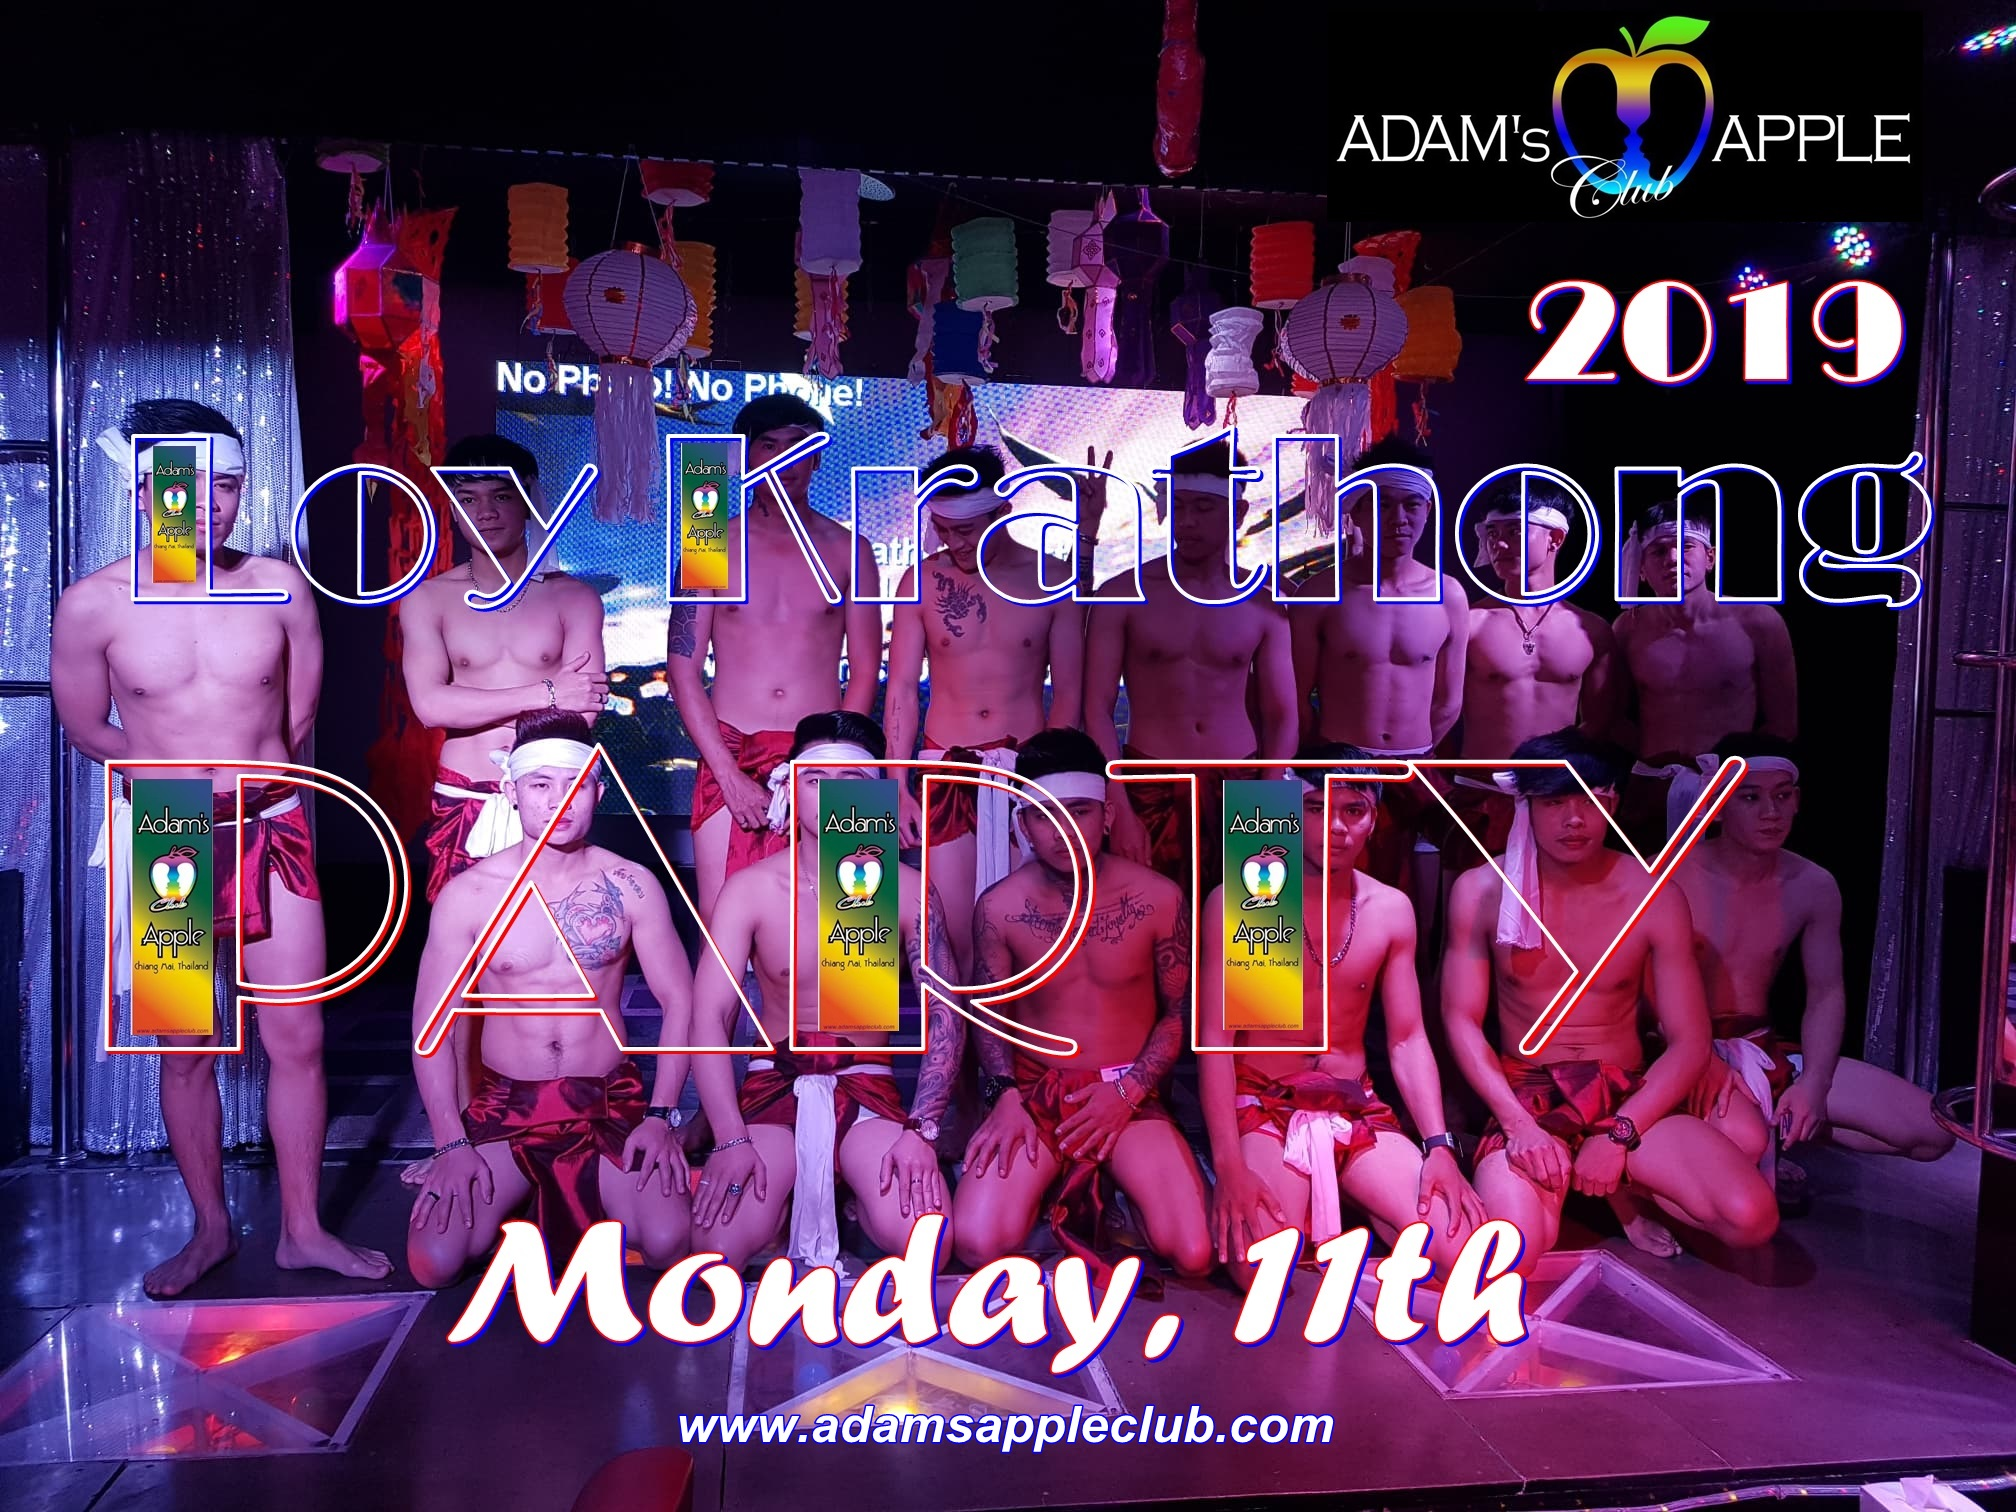 Loy Krathong 2019 PARTY Adams Apple Club